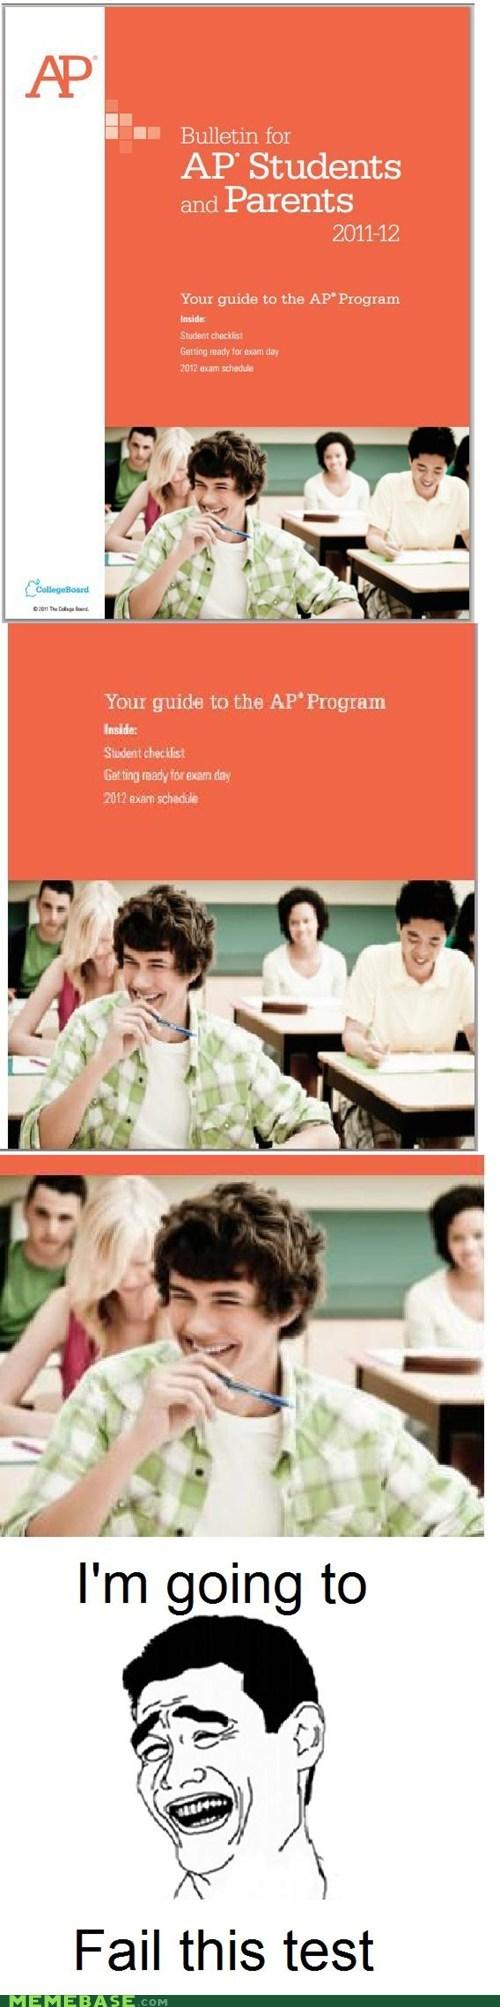 AP college collegeboard program Rage Comics students tests - 5902016256